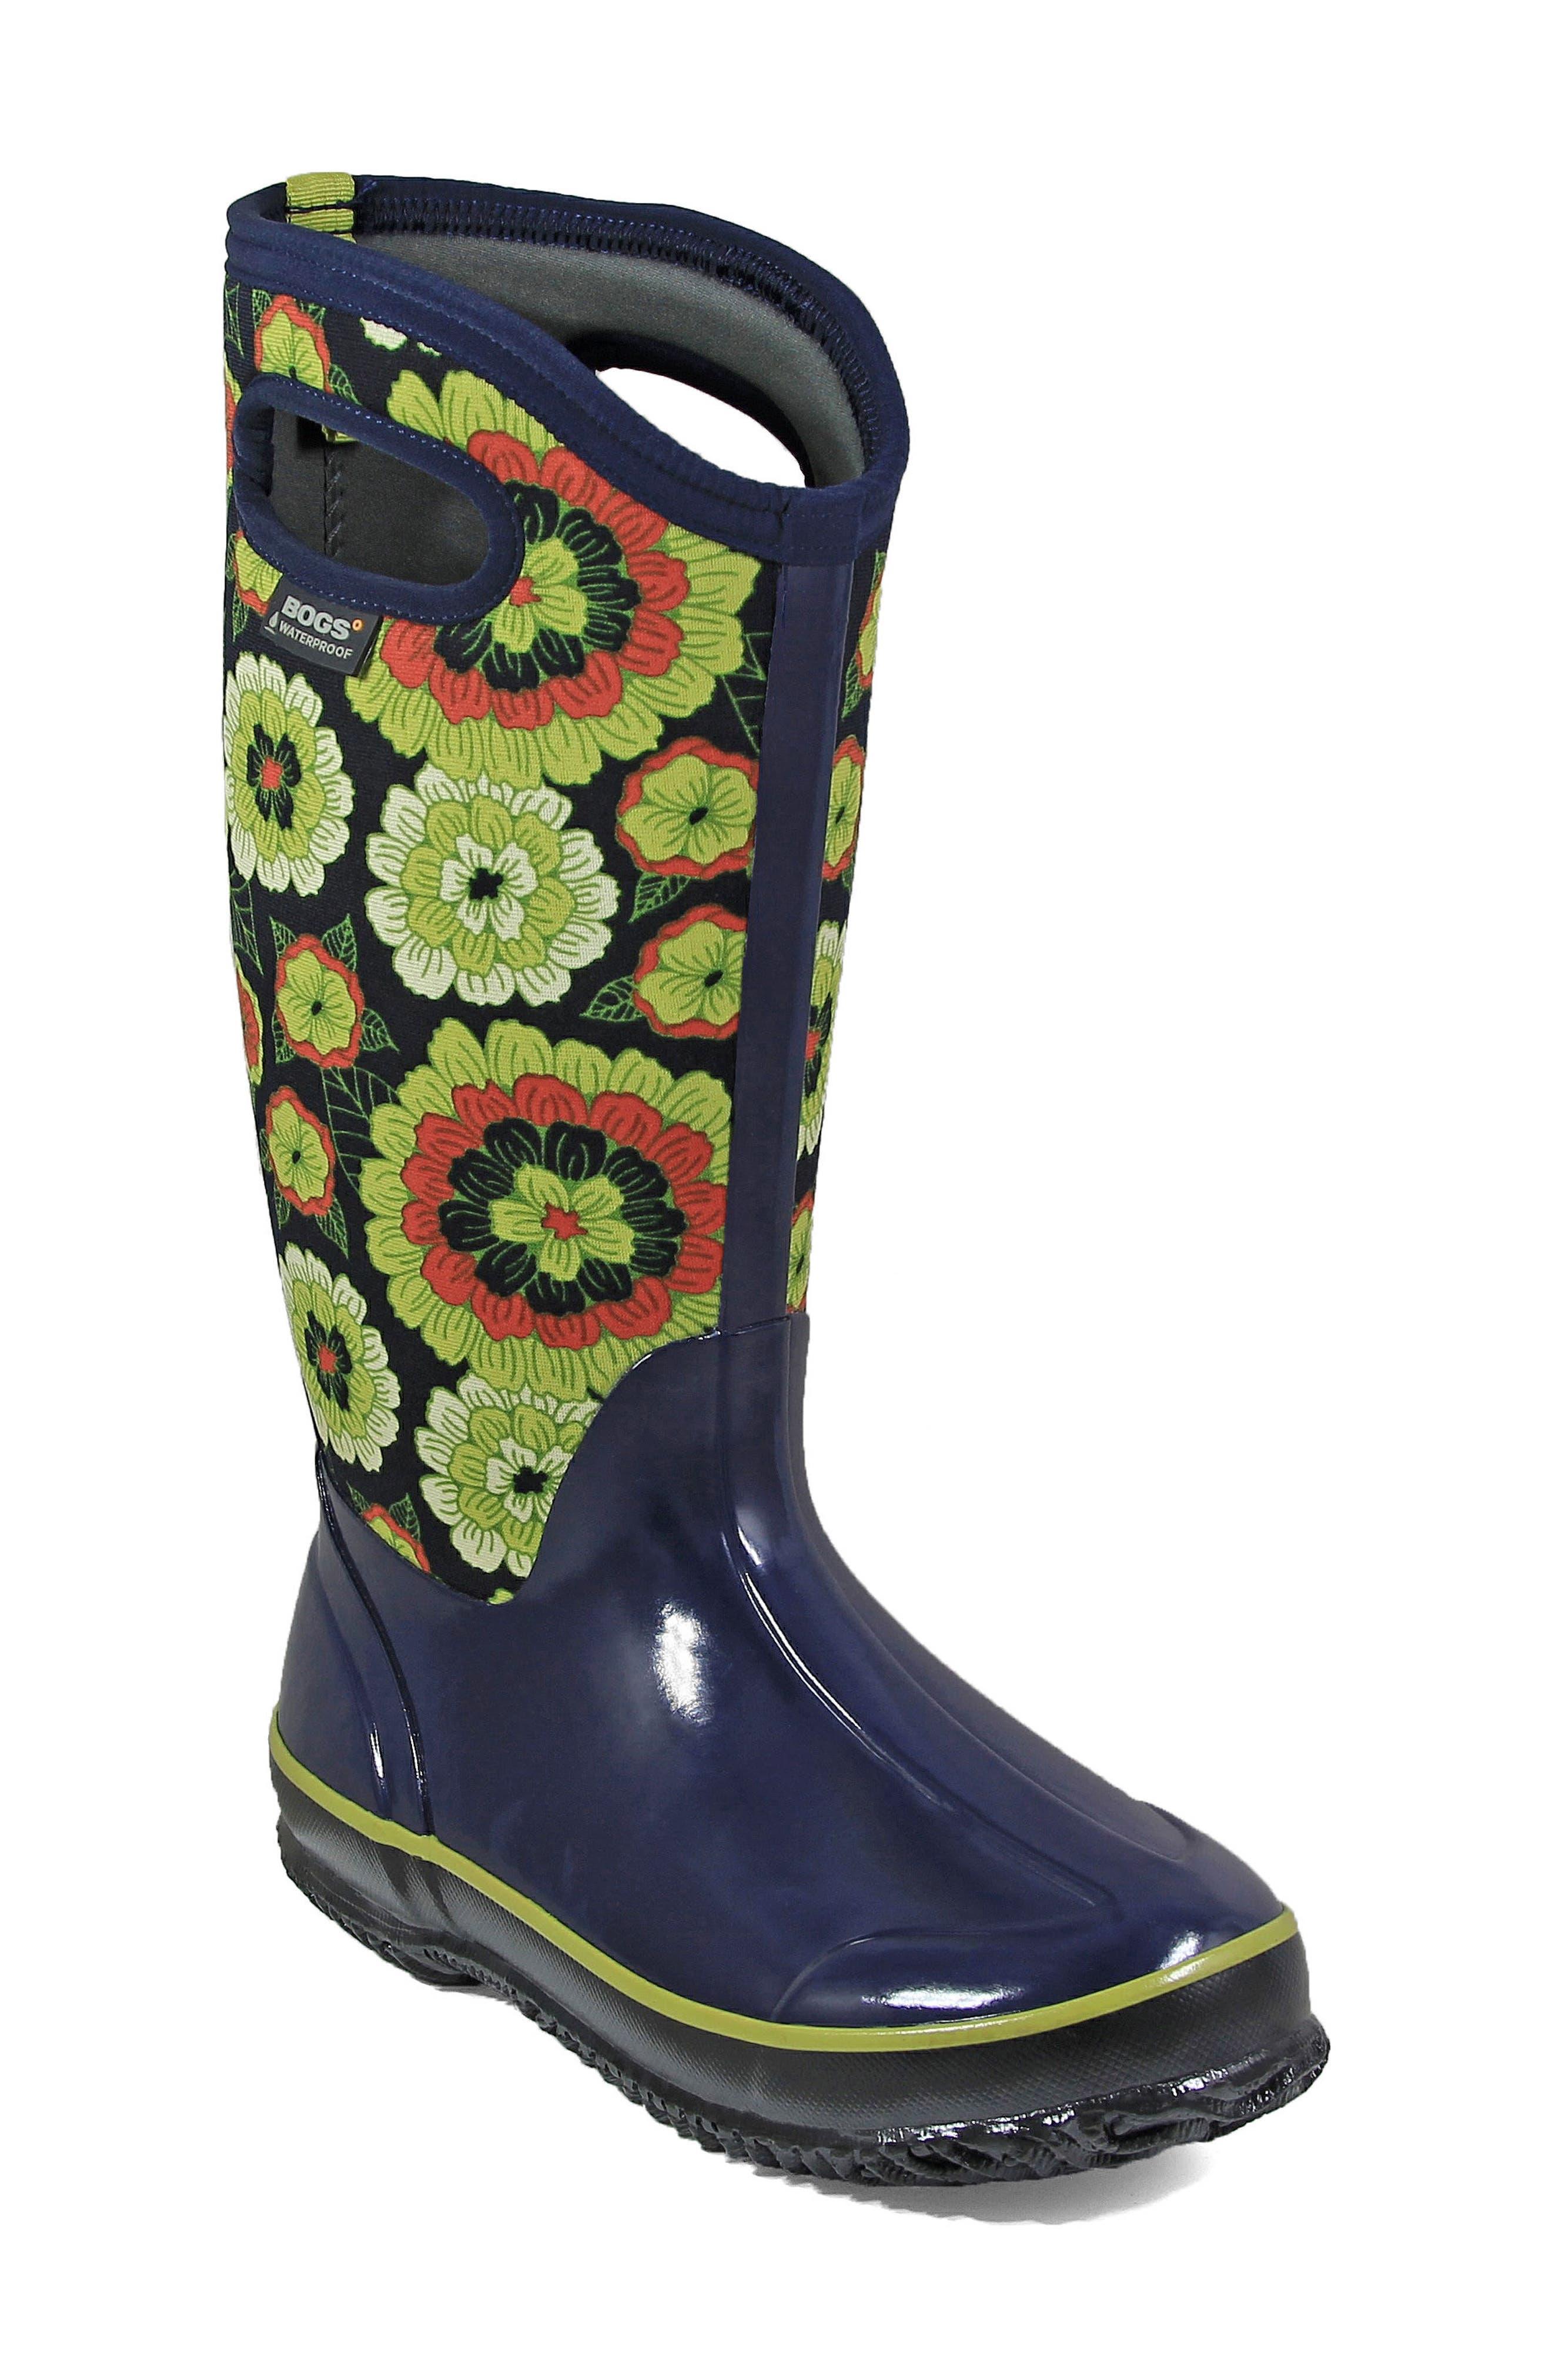 Main Image - Bogs Classic Pansies Waterproof Insulated Boot (Women)